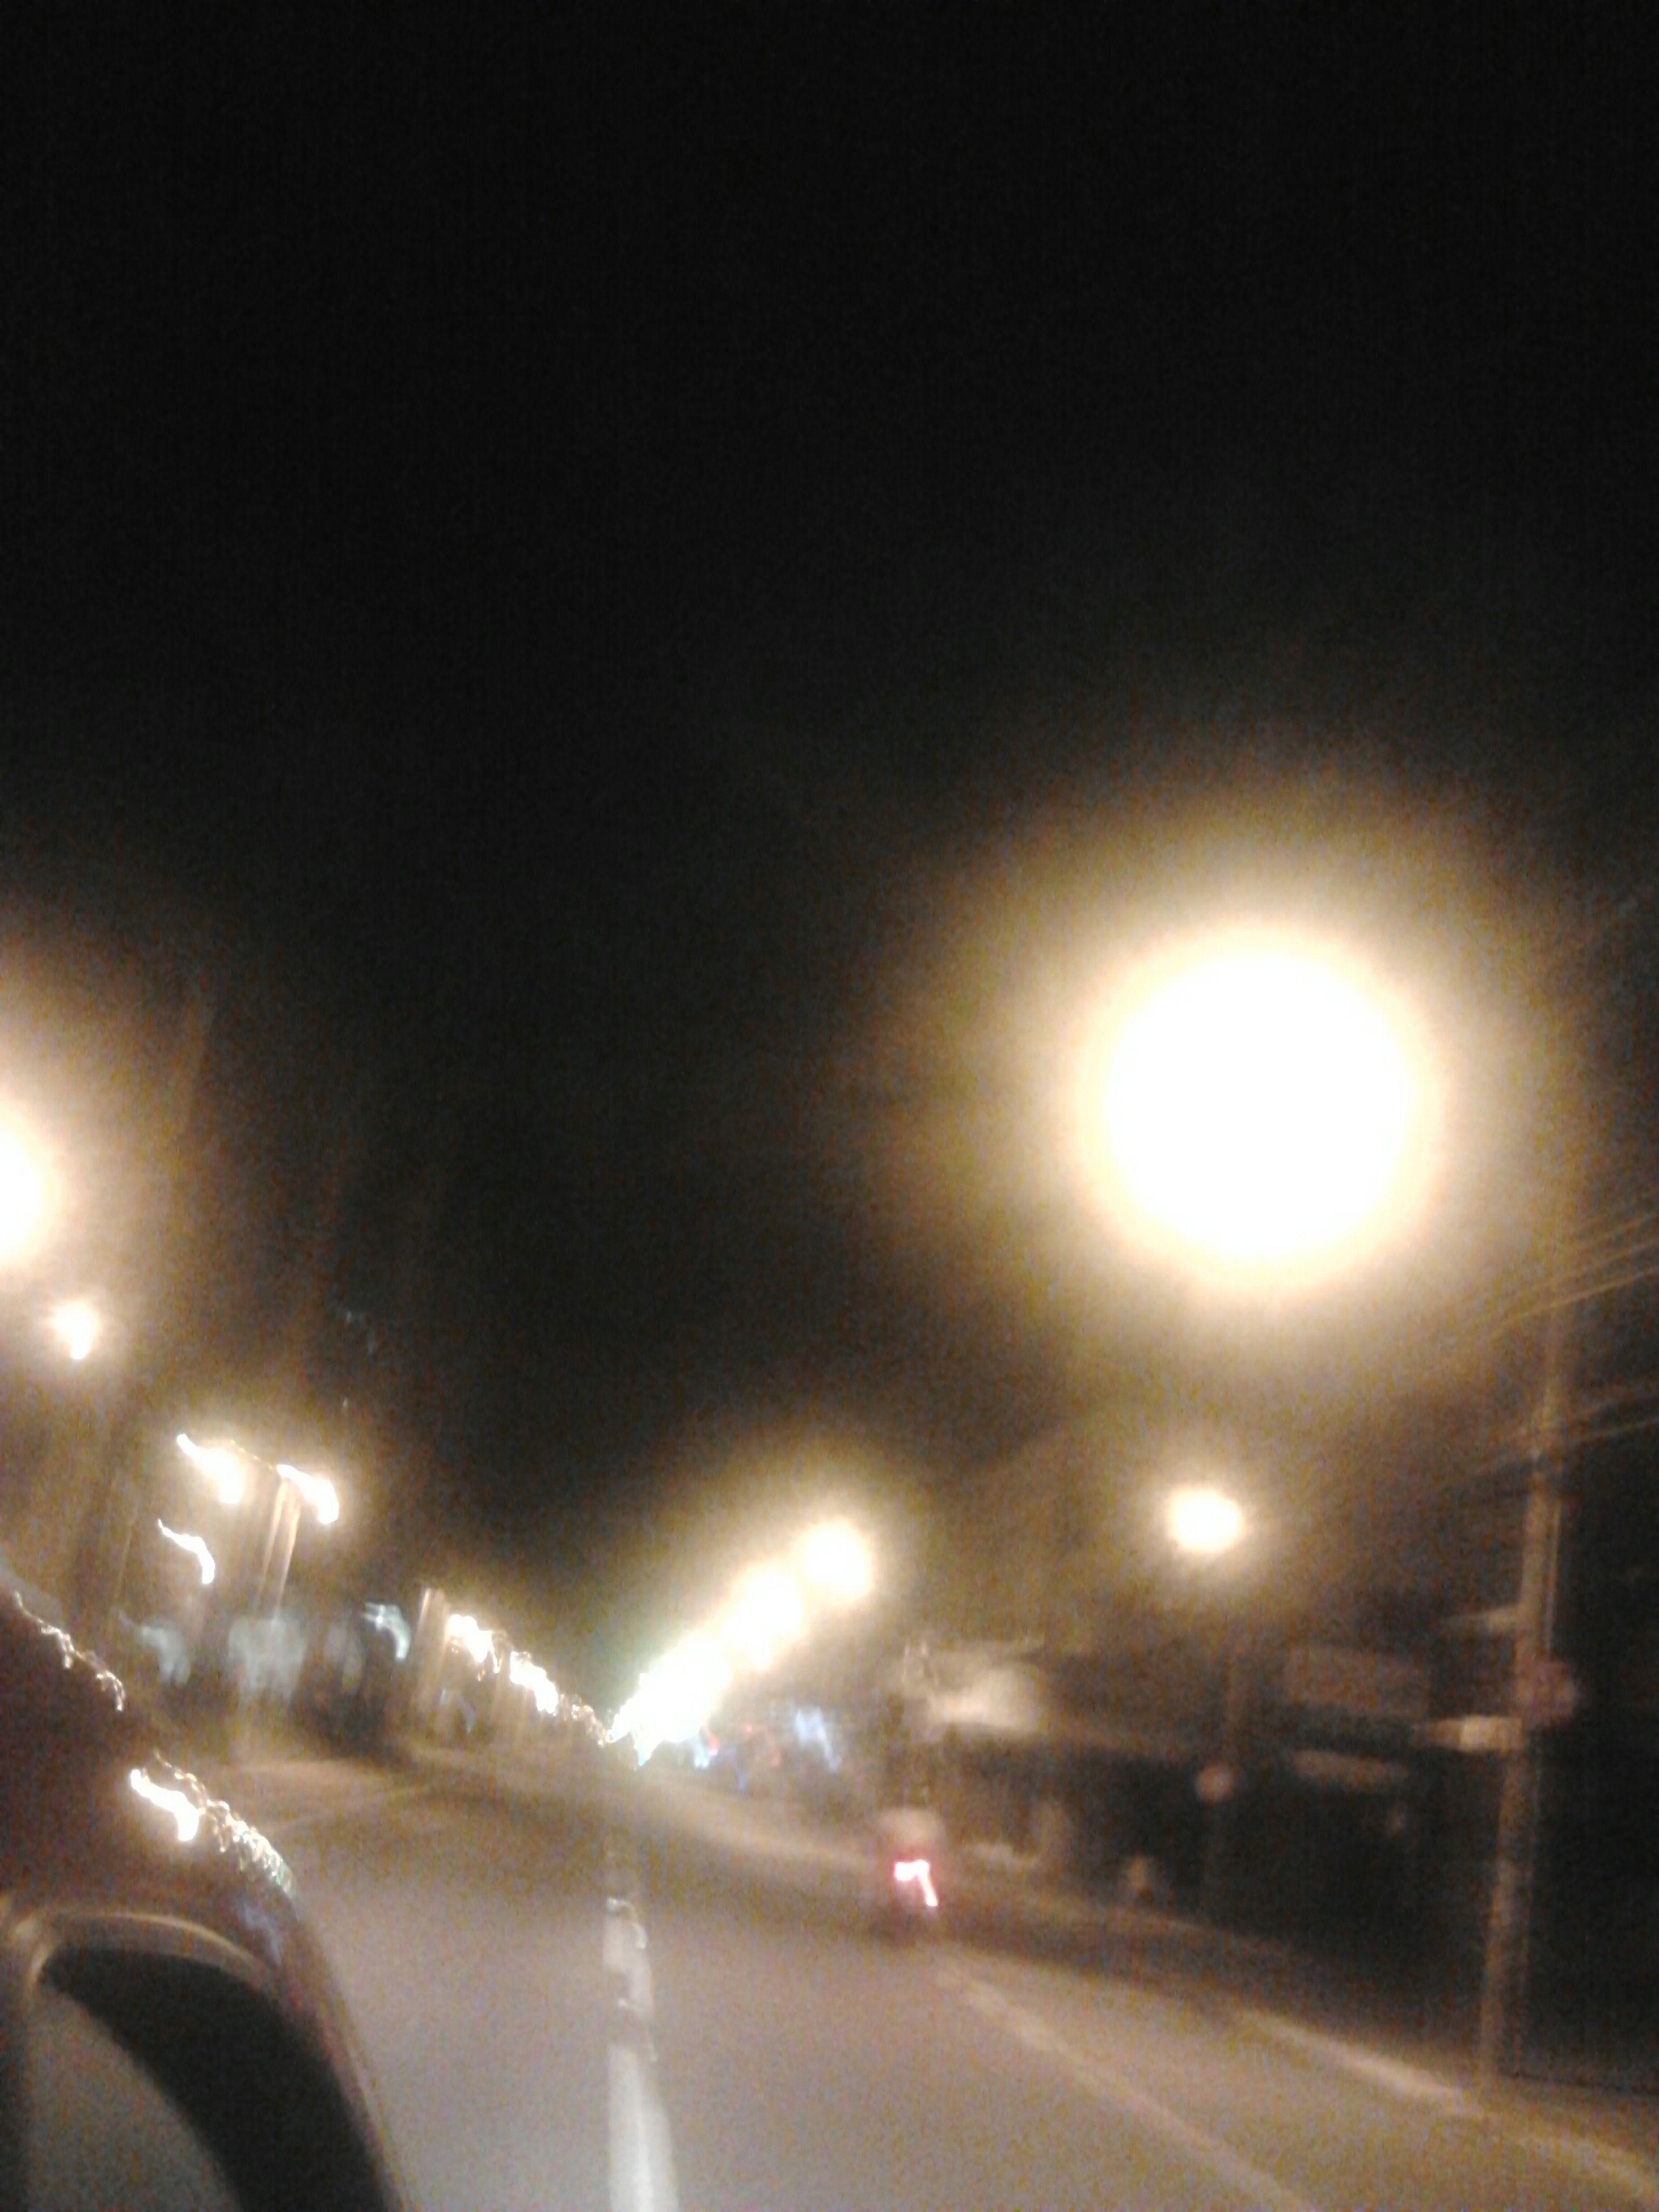 illuminated, night, street light, transportation, no people, sky, road, outdoors